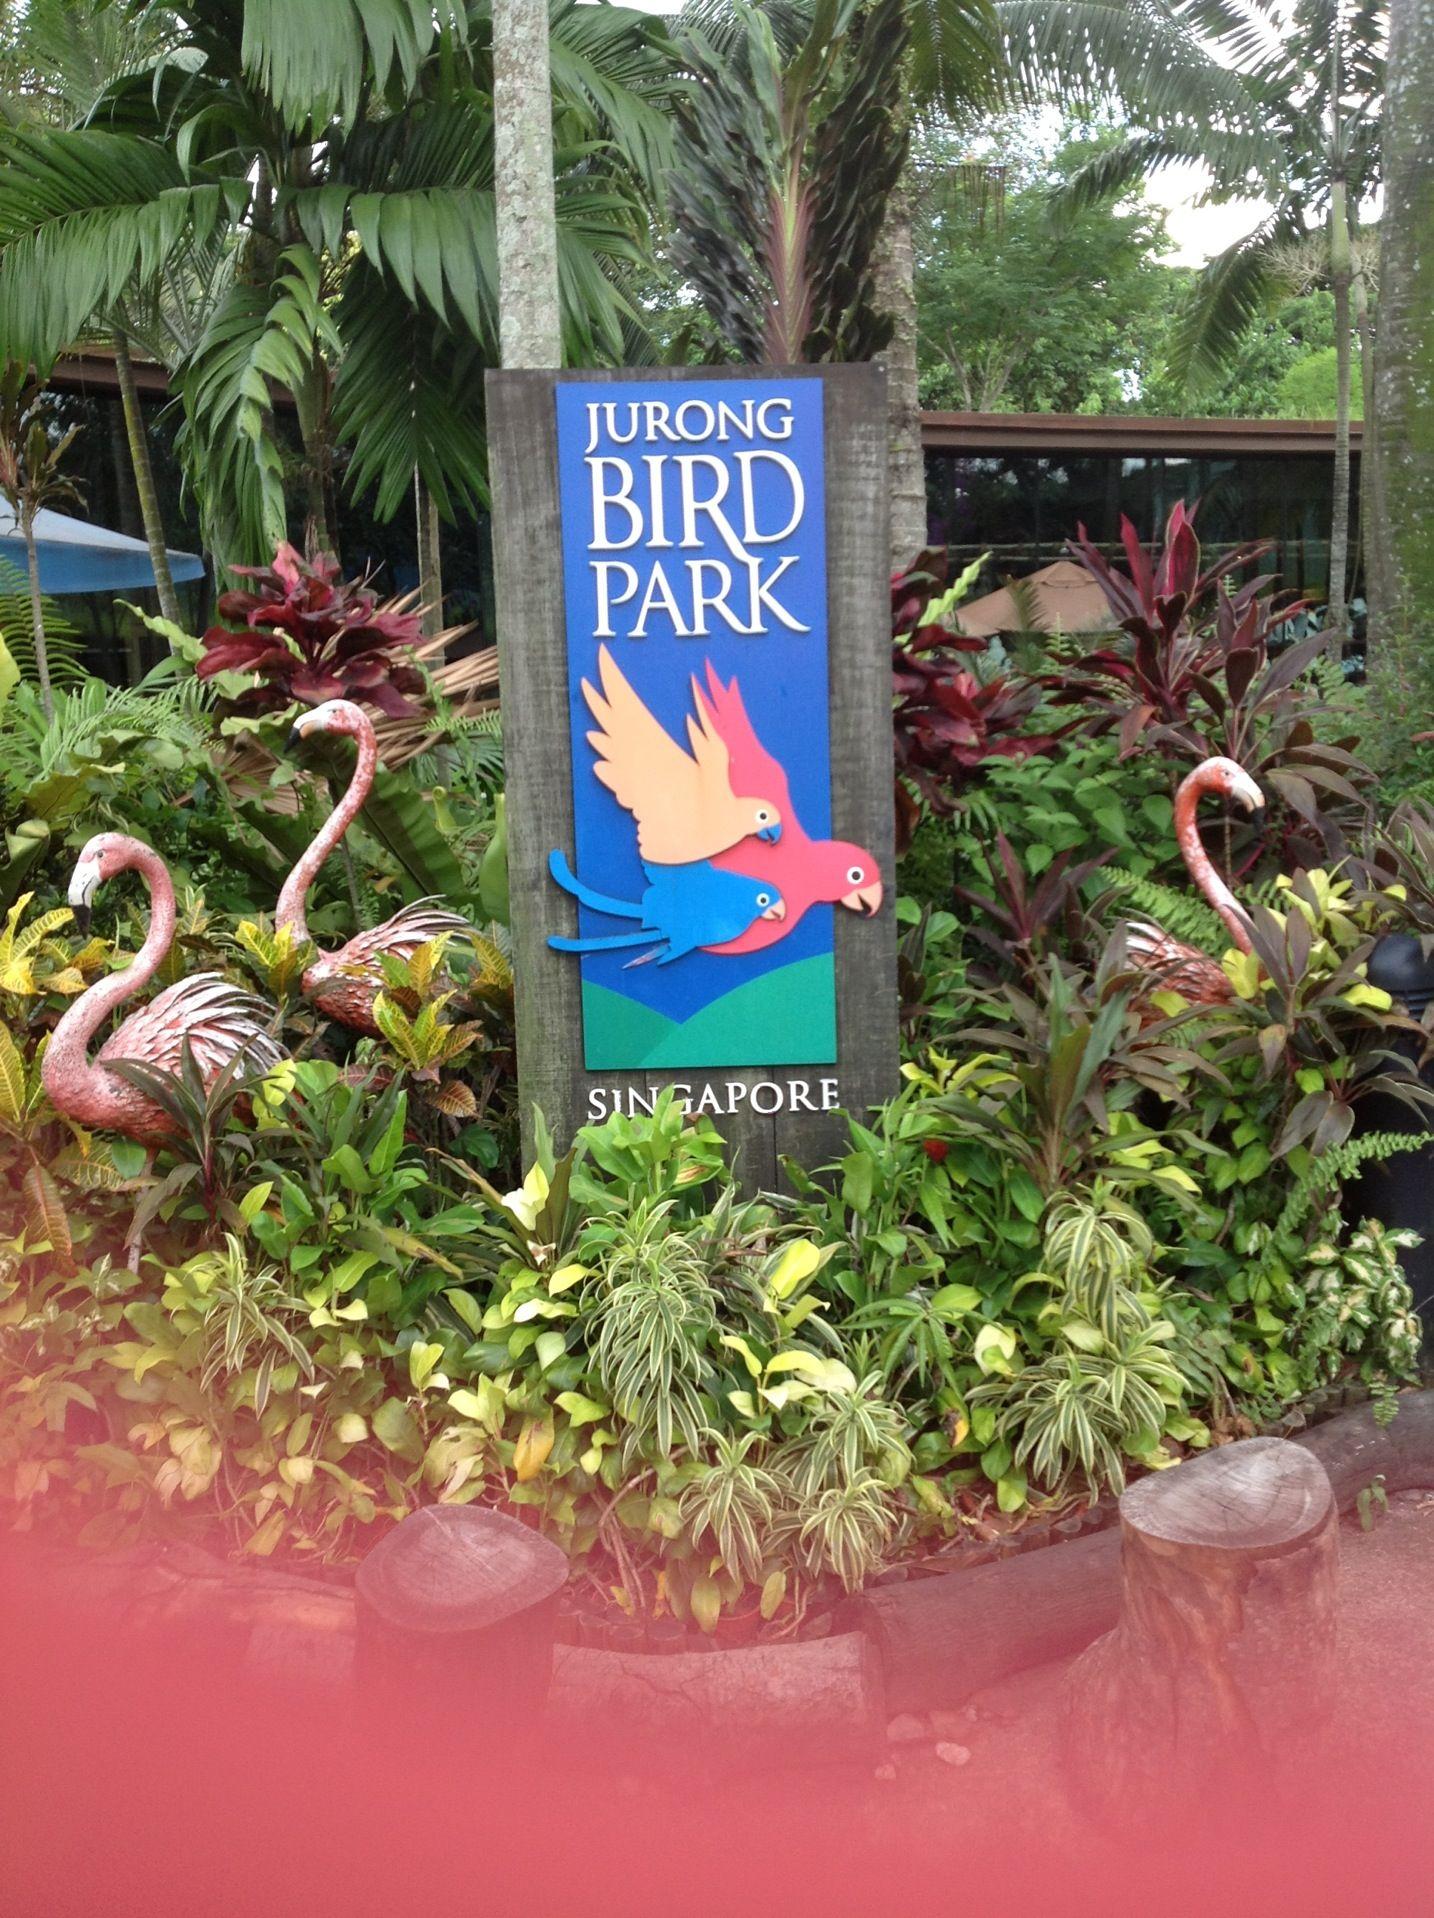 Jurong Bird Park in Singapore